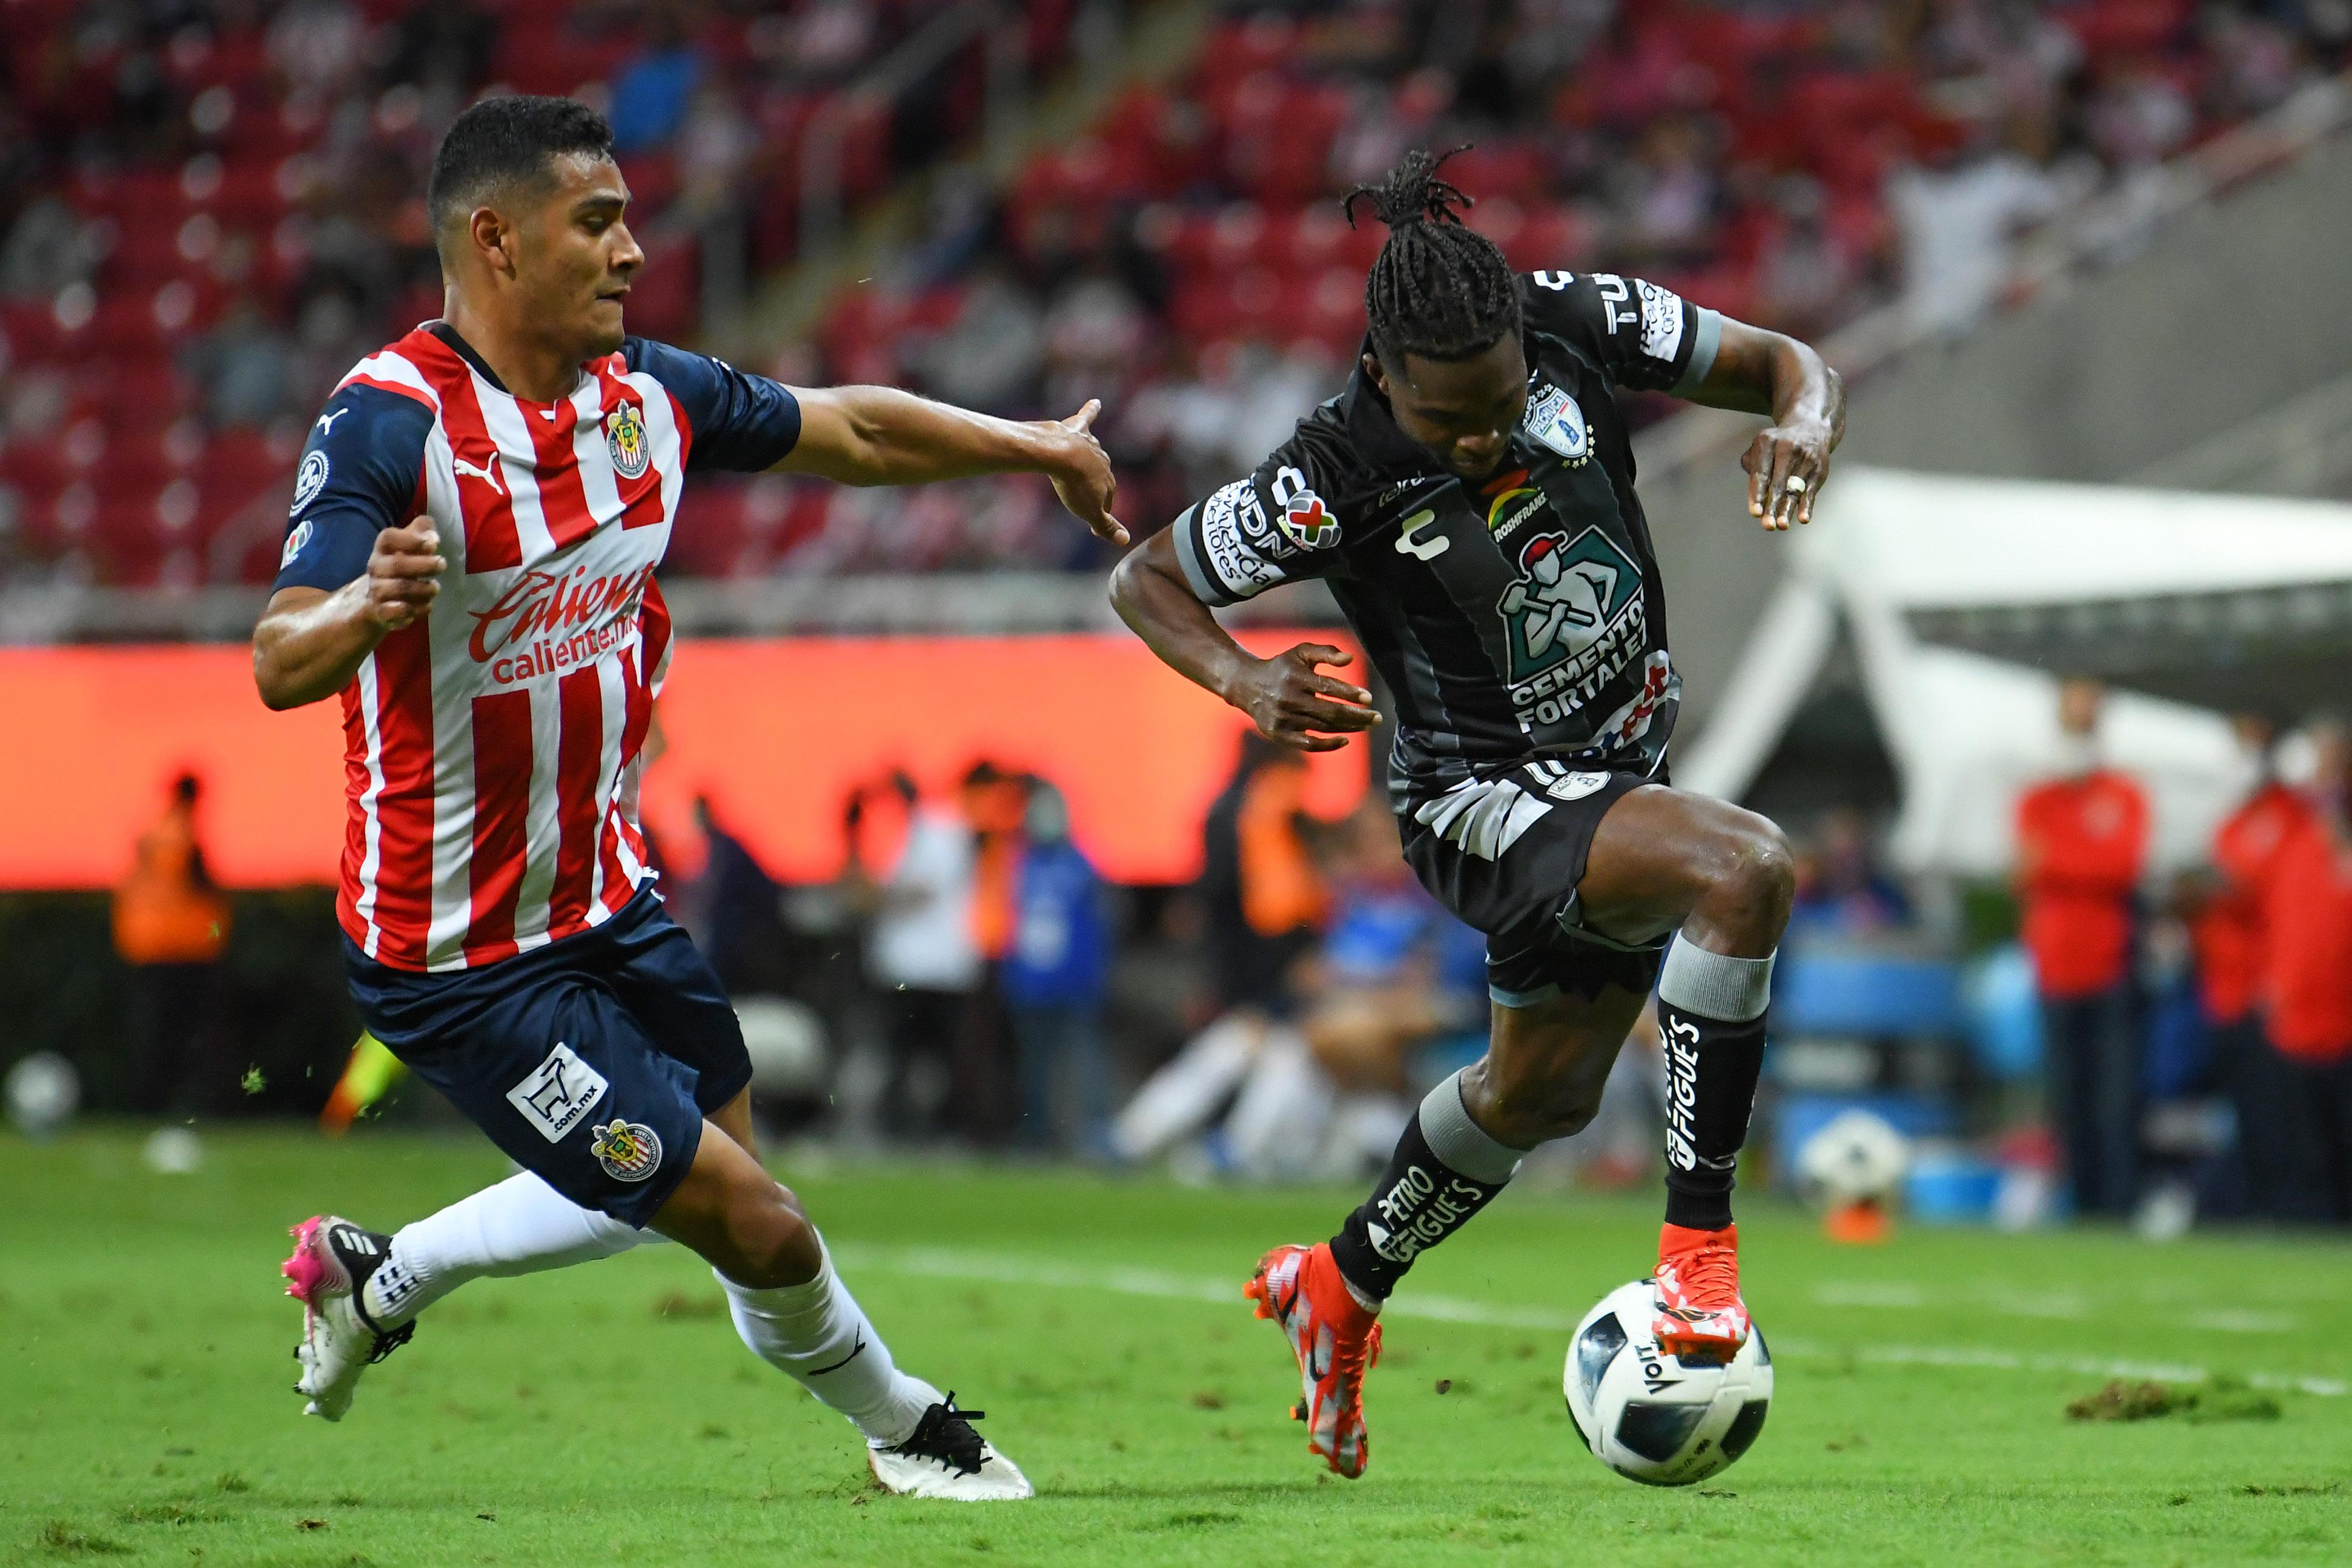 Chivas vs Pachuca 1-0 Torneo Apertura 2021